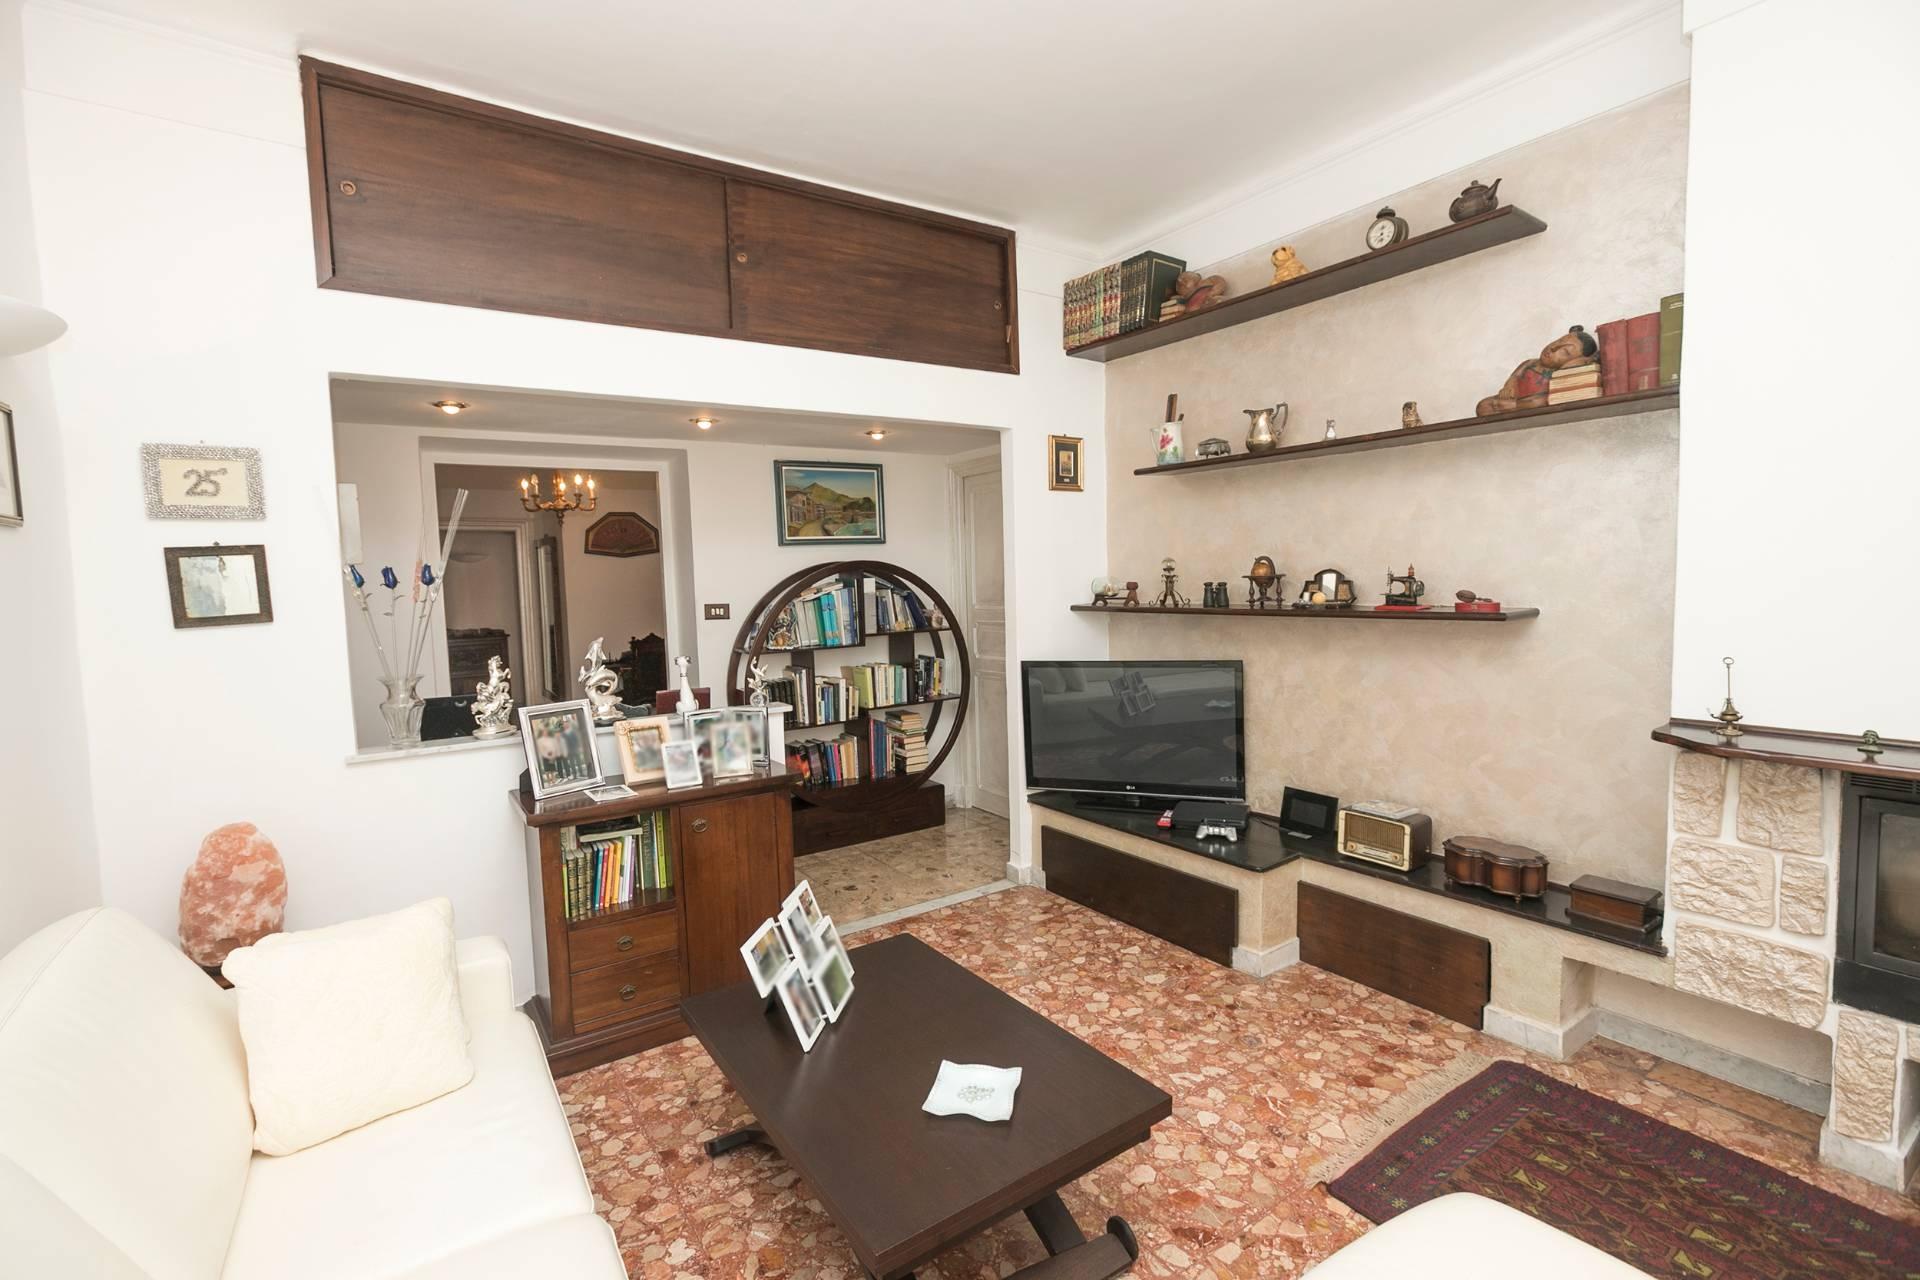 Appartamento, 155 Mq, Vendita - Genova (Genova)